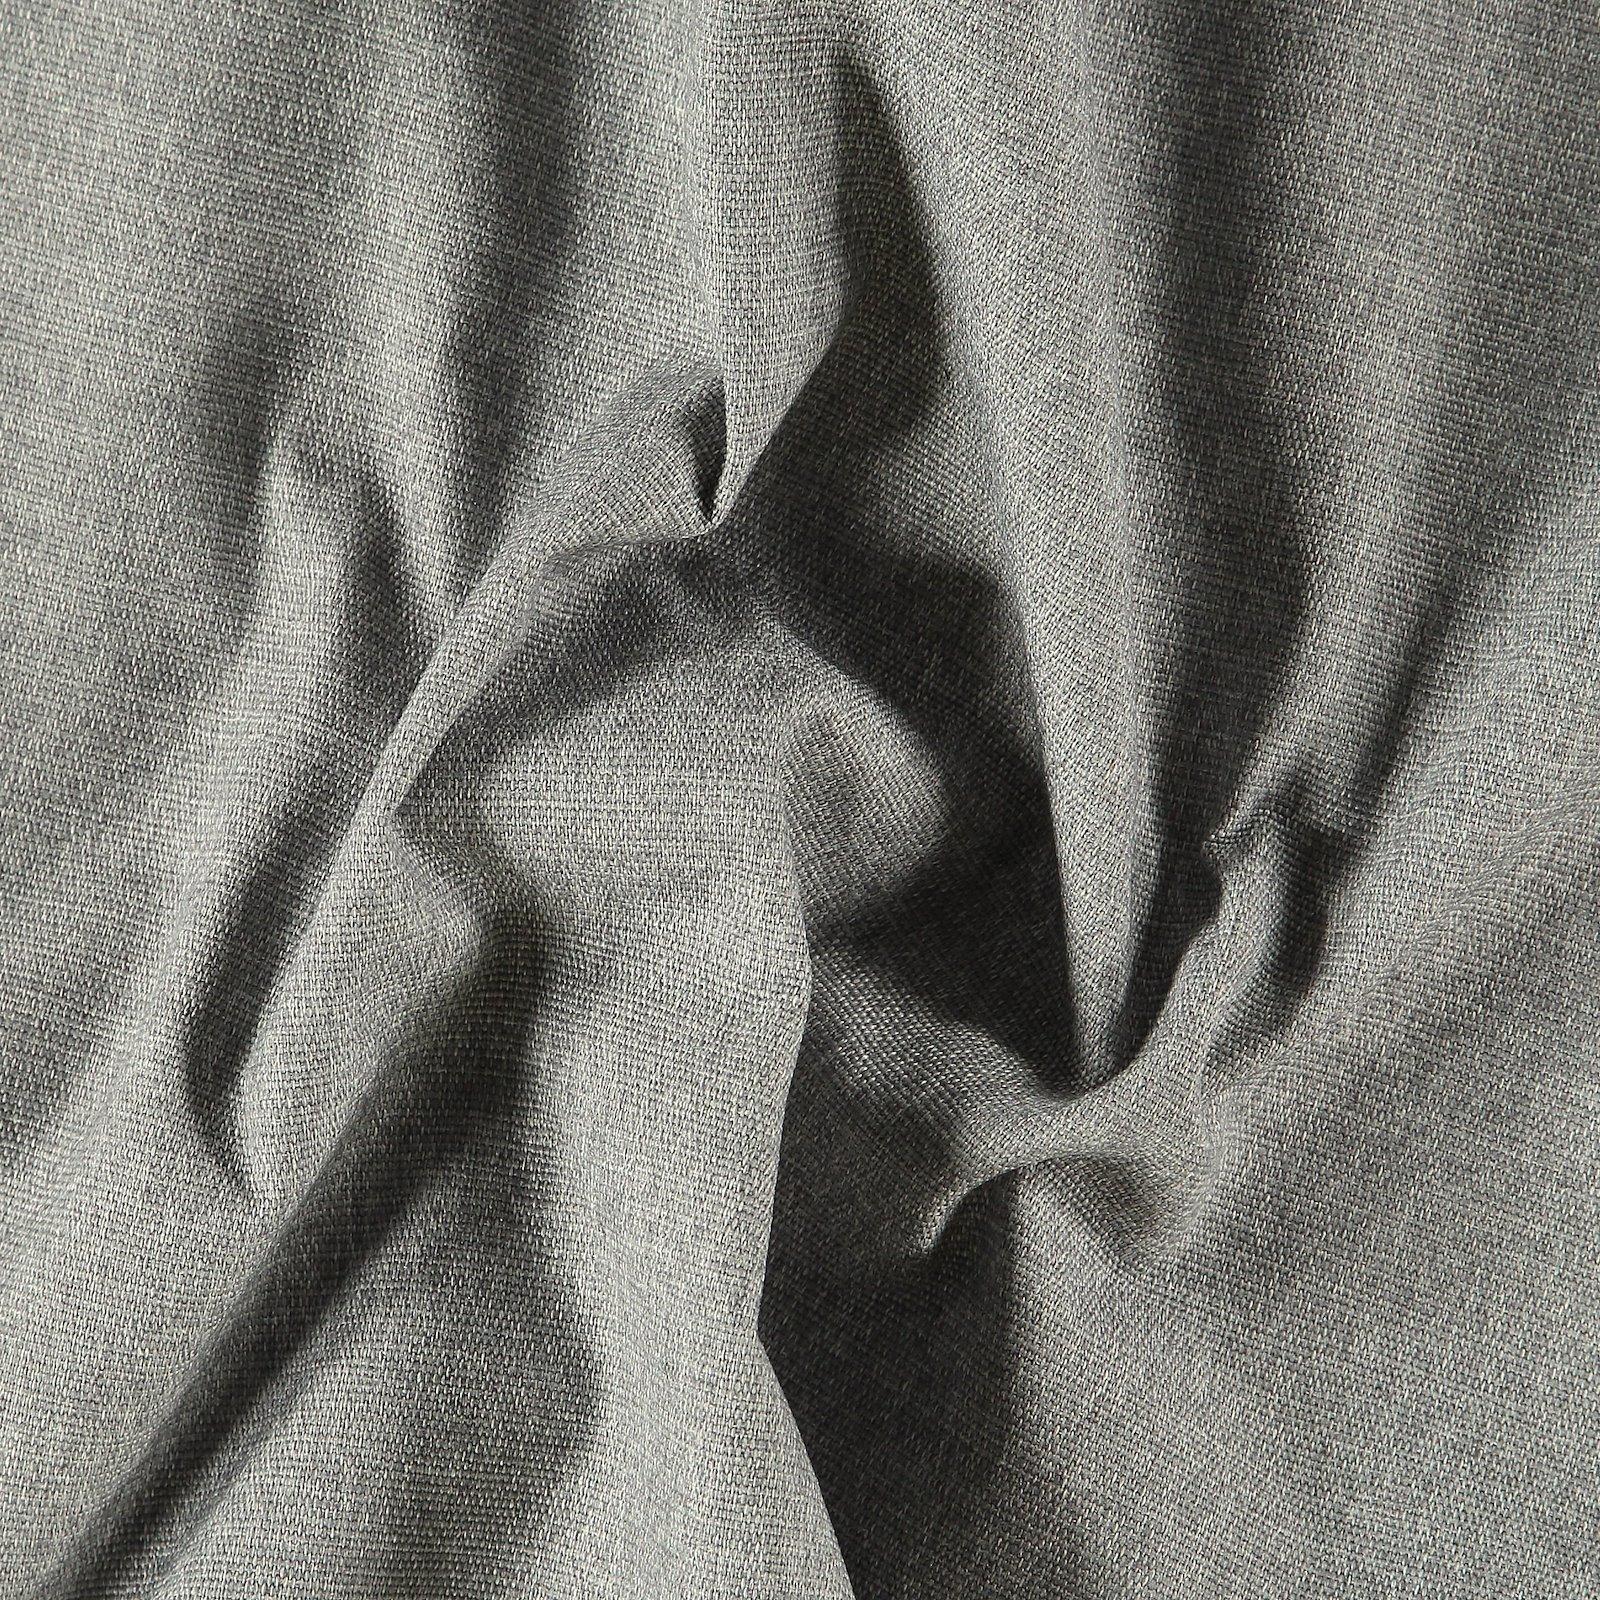 Upholstery fabric grey w/black backing